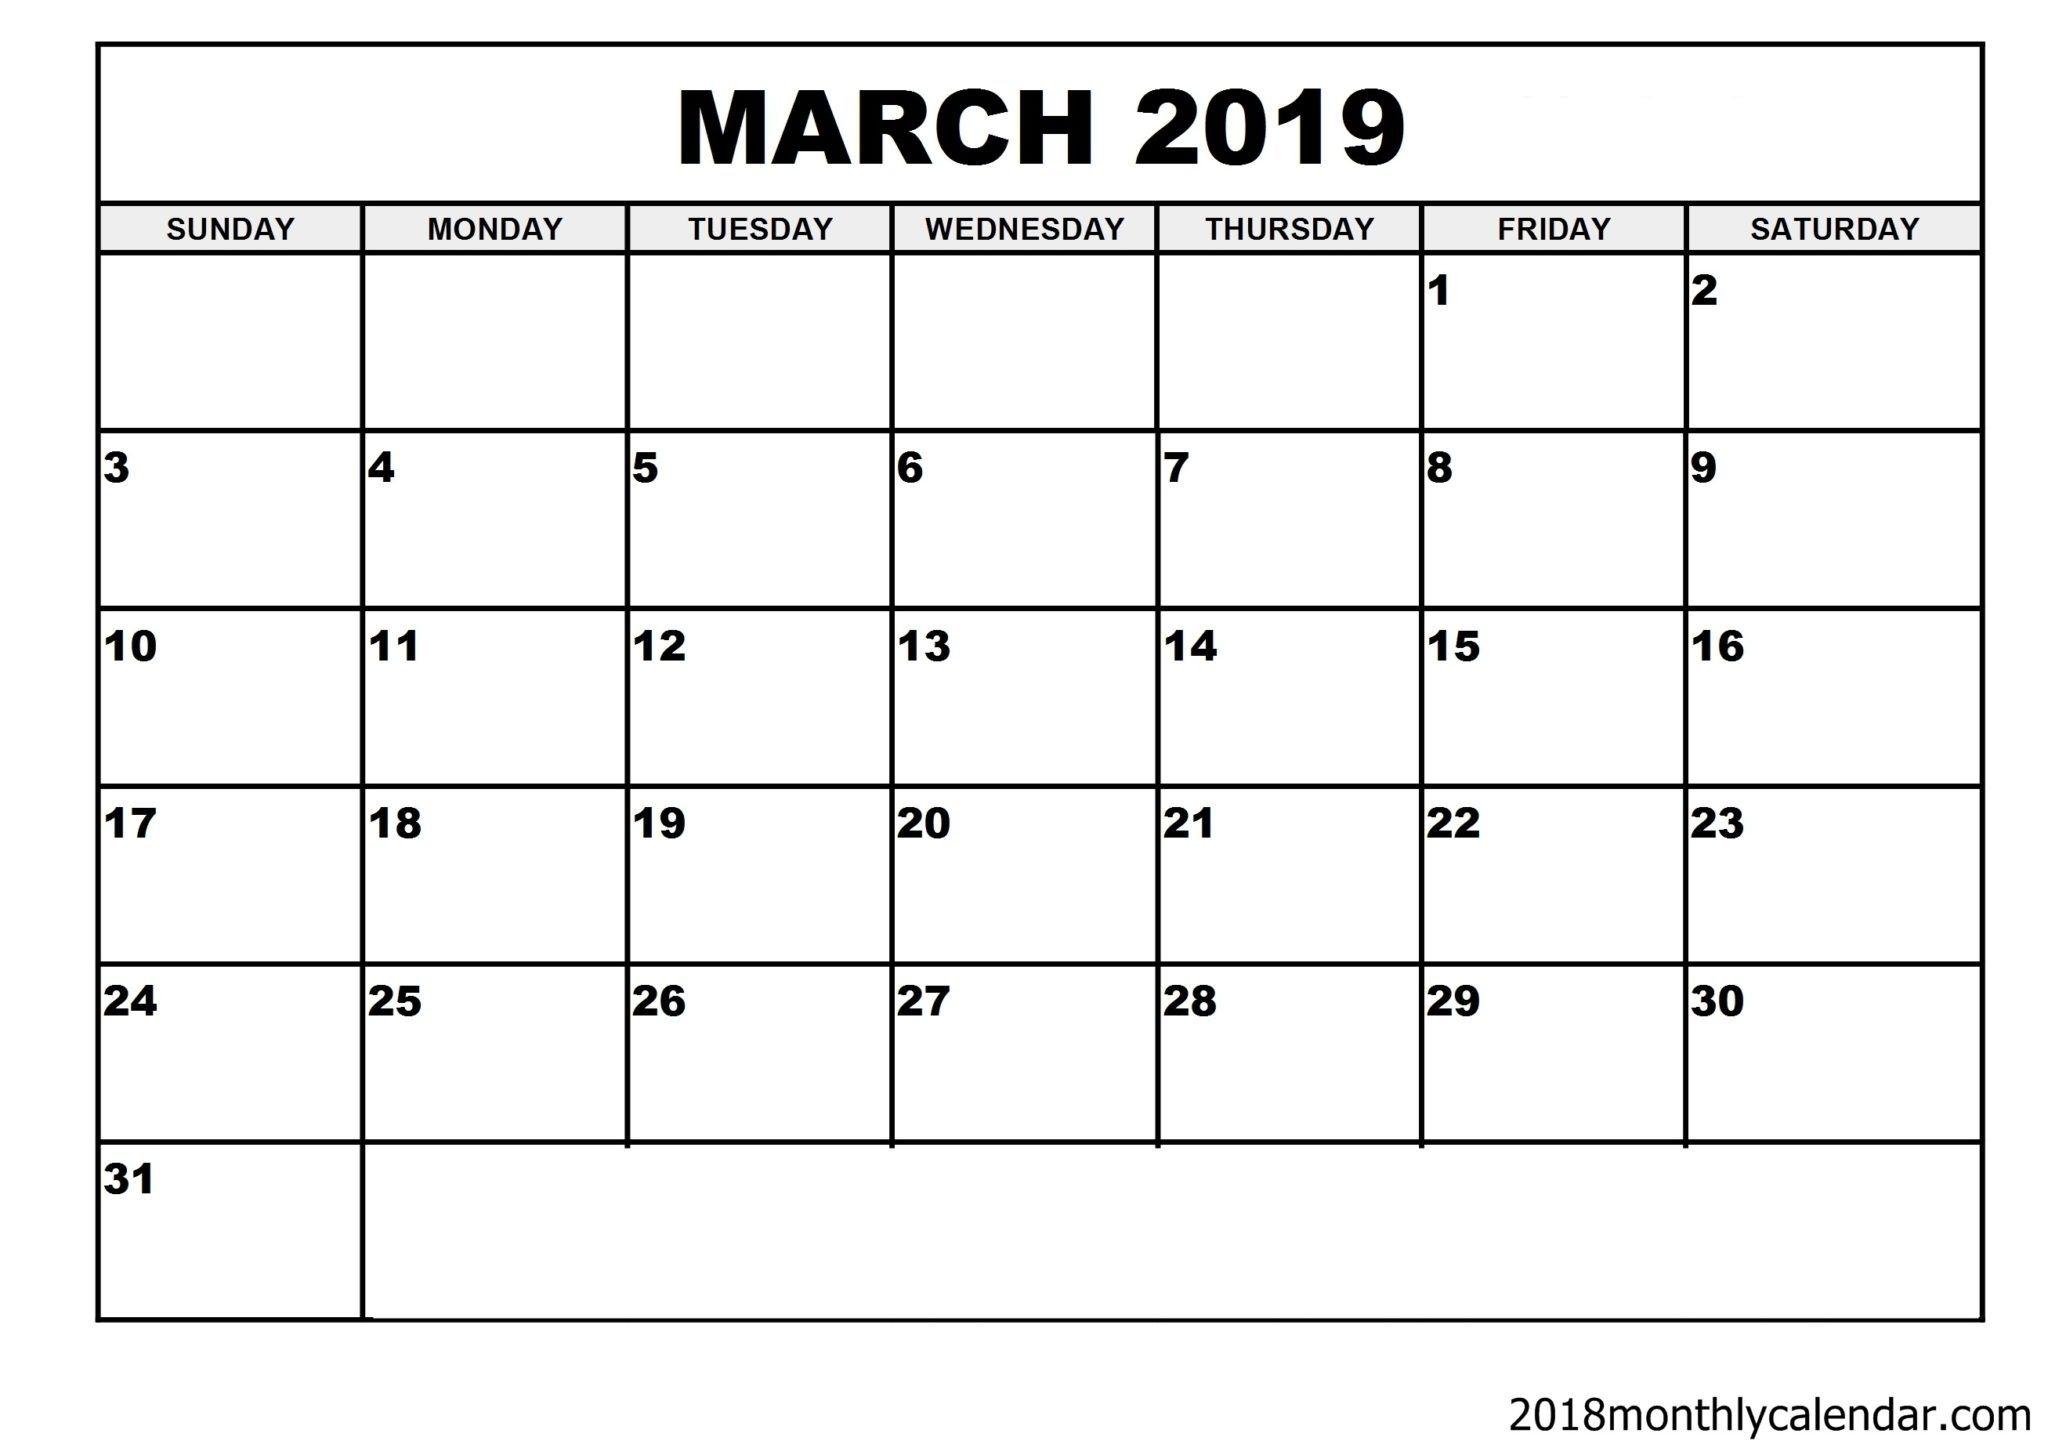 Download March 2019 Calendar – Blank Template - Editable Calendar for Free Fill In Calendar Templates Month